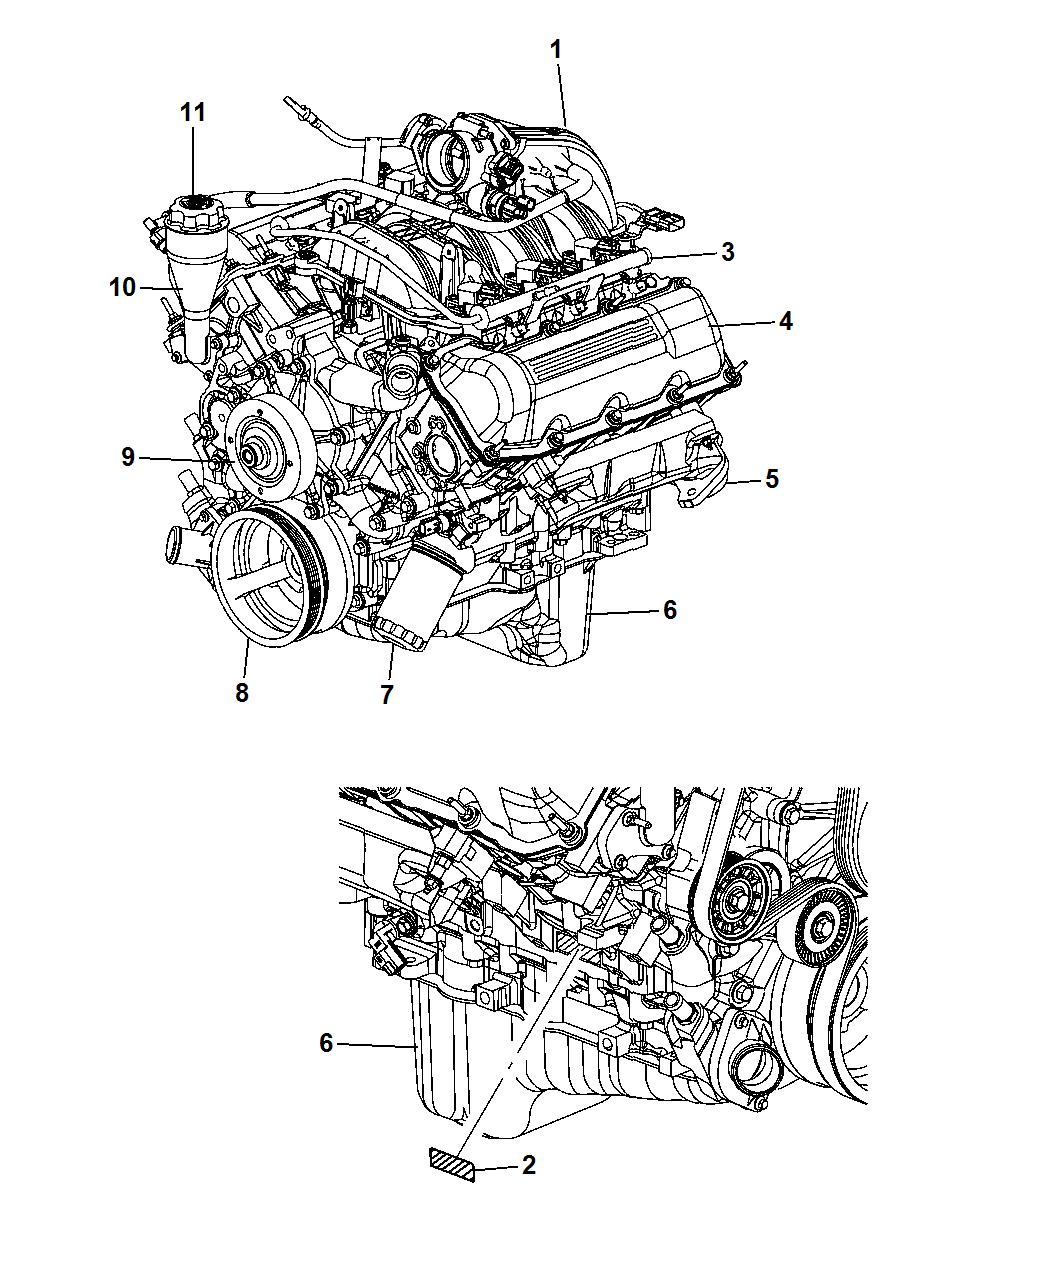 2007 Dodge Nitro 3 7l Engine Diagram Wiring Diagram Resource Resource Led Illumina It